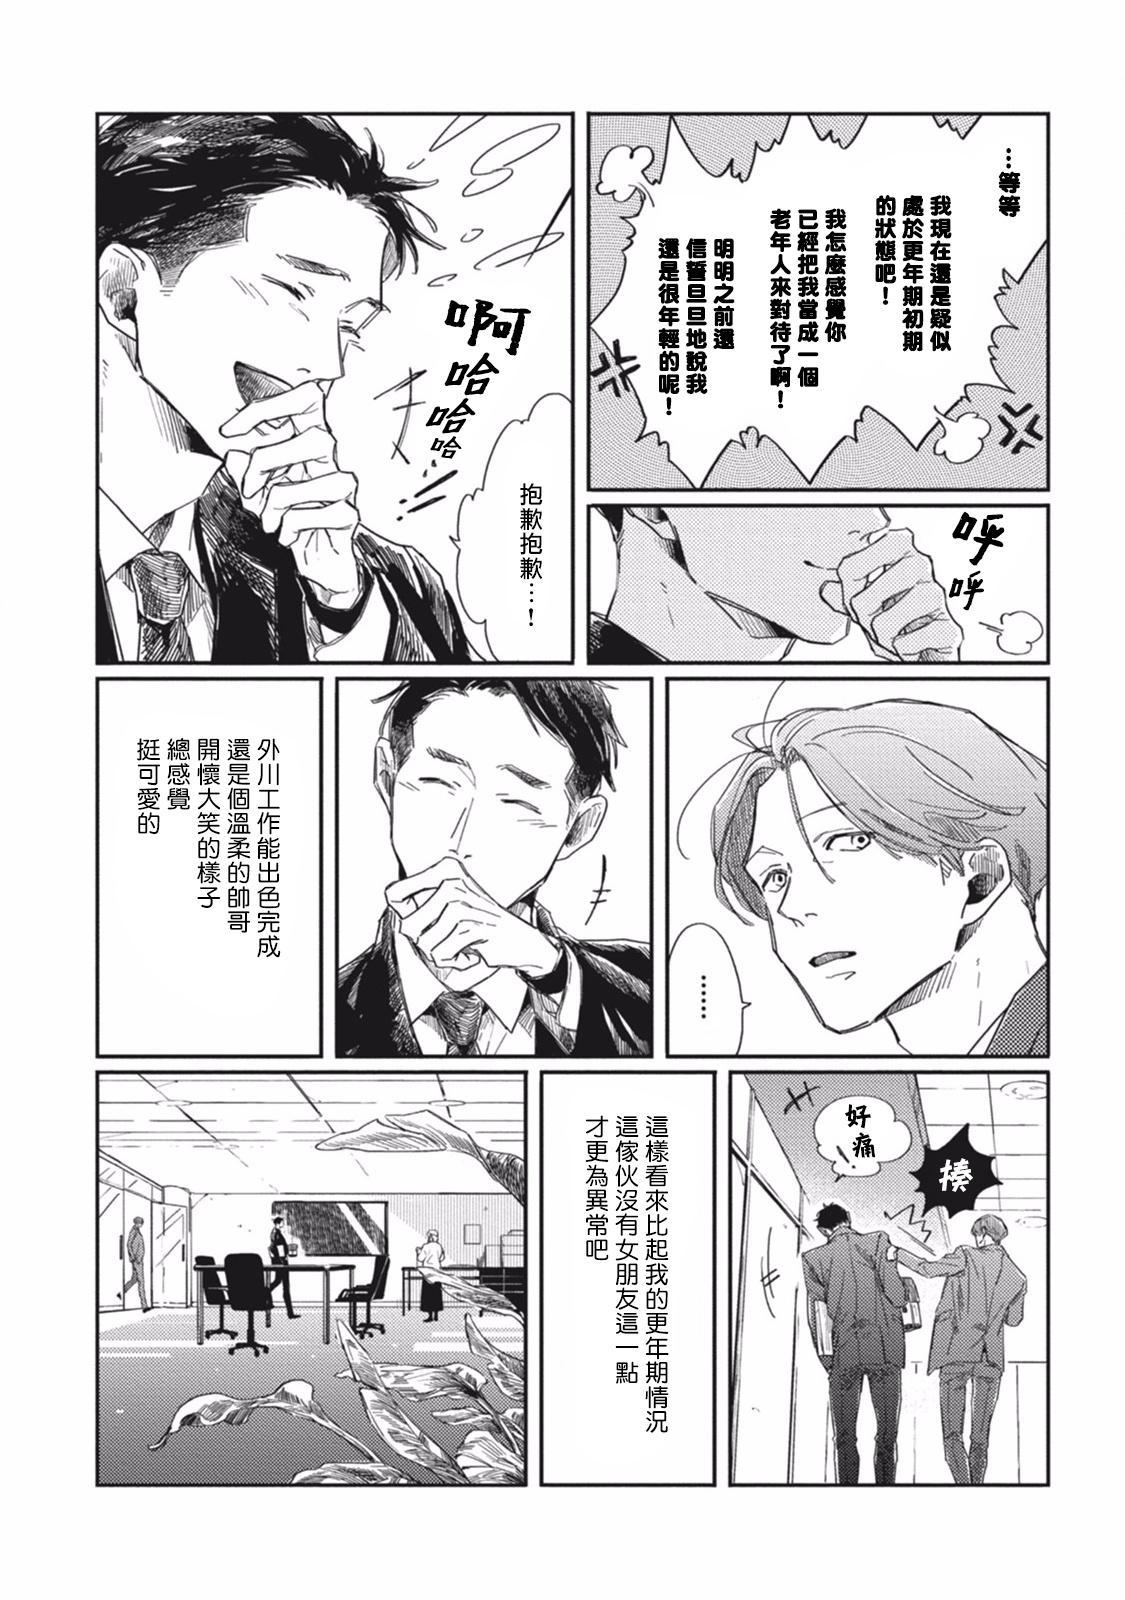 [Sagan Sagan] Old-fashioned Cupcake Ch. 1-2 [Chinese] [拾荒者汉化组] [Digital] 52